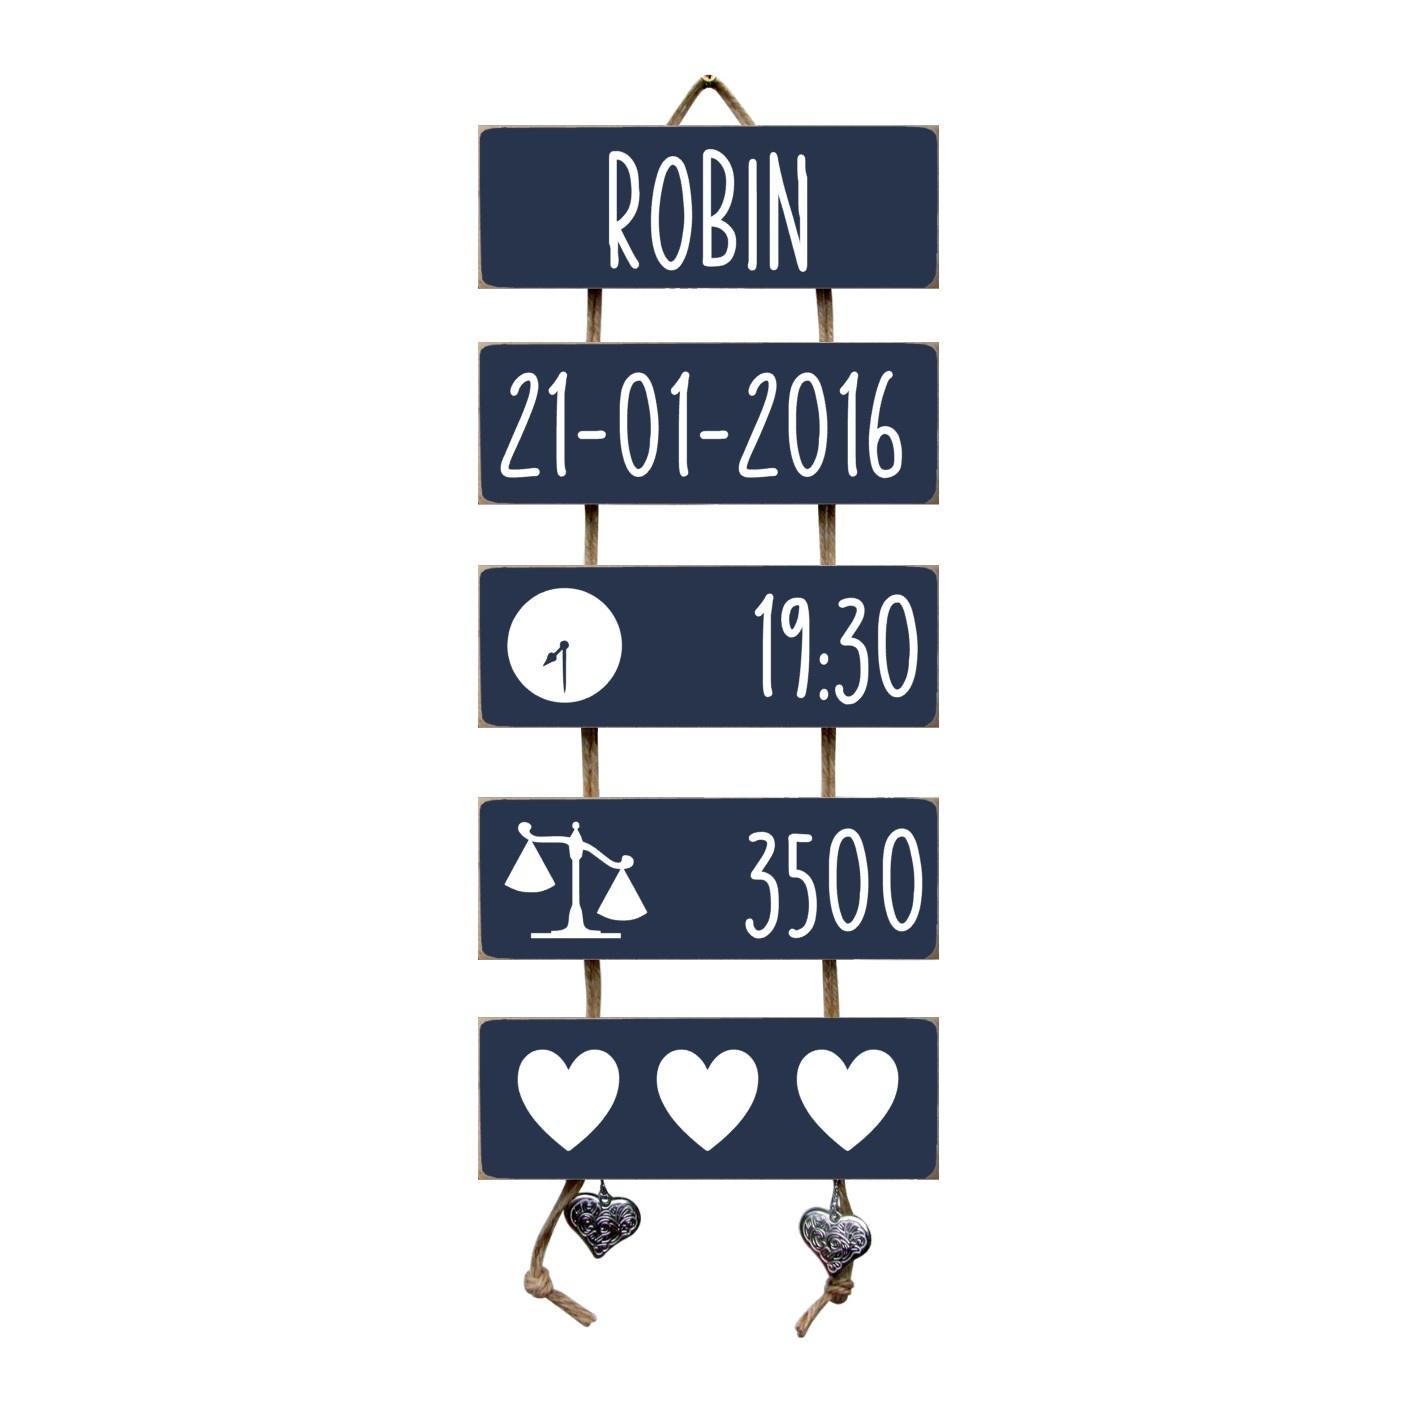 Kraamcadeau Geboorteladder Robin donkerblauw